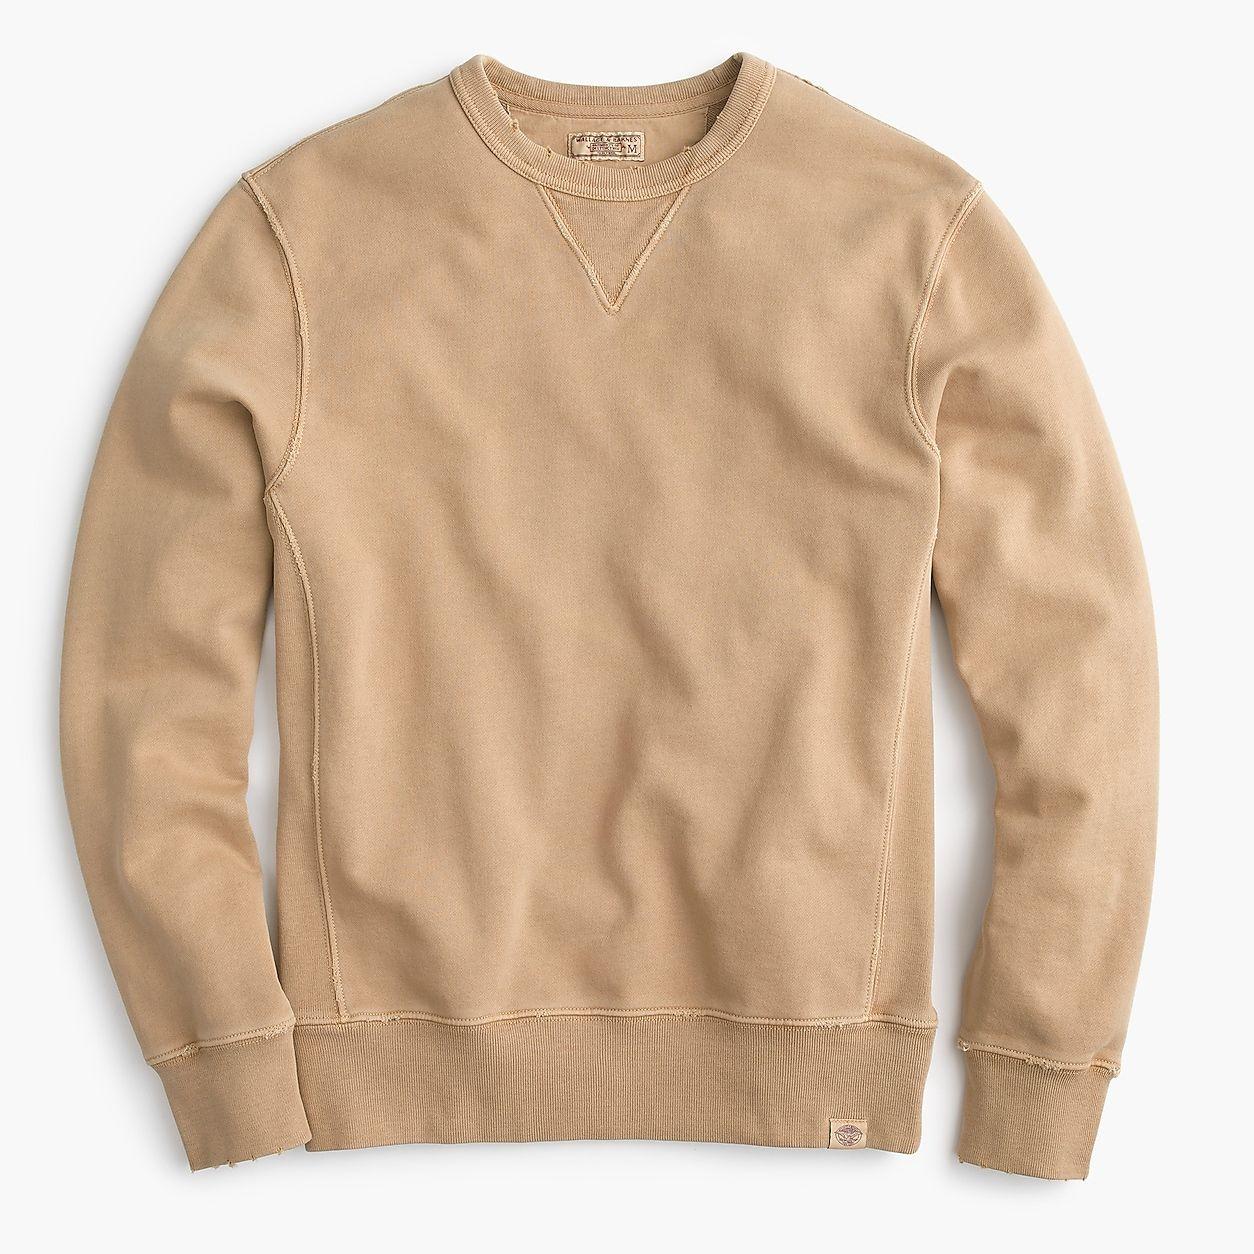 Wallace Barnes Garment Dyed Crewneck Sweatshirt Crewneck Sweatshirt Outfit Sweatshirts Long Sleeve Tshirt Men [ 1254 x 1254 Pixel ]